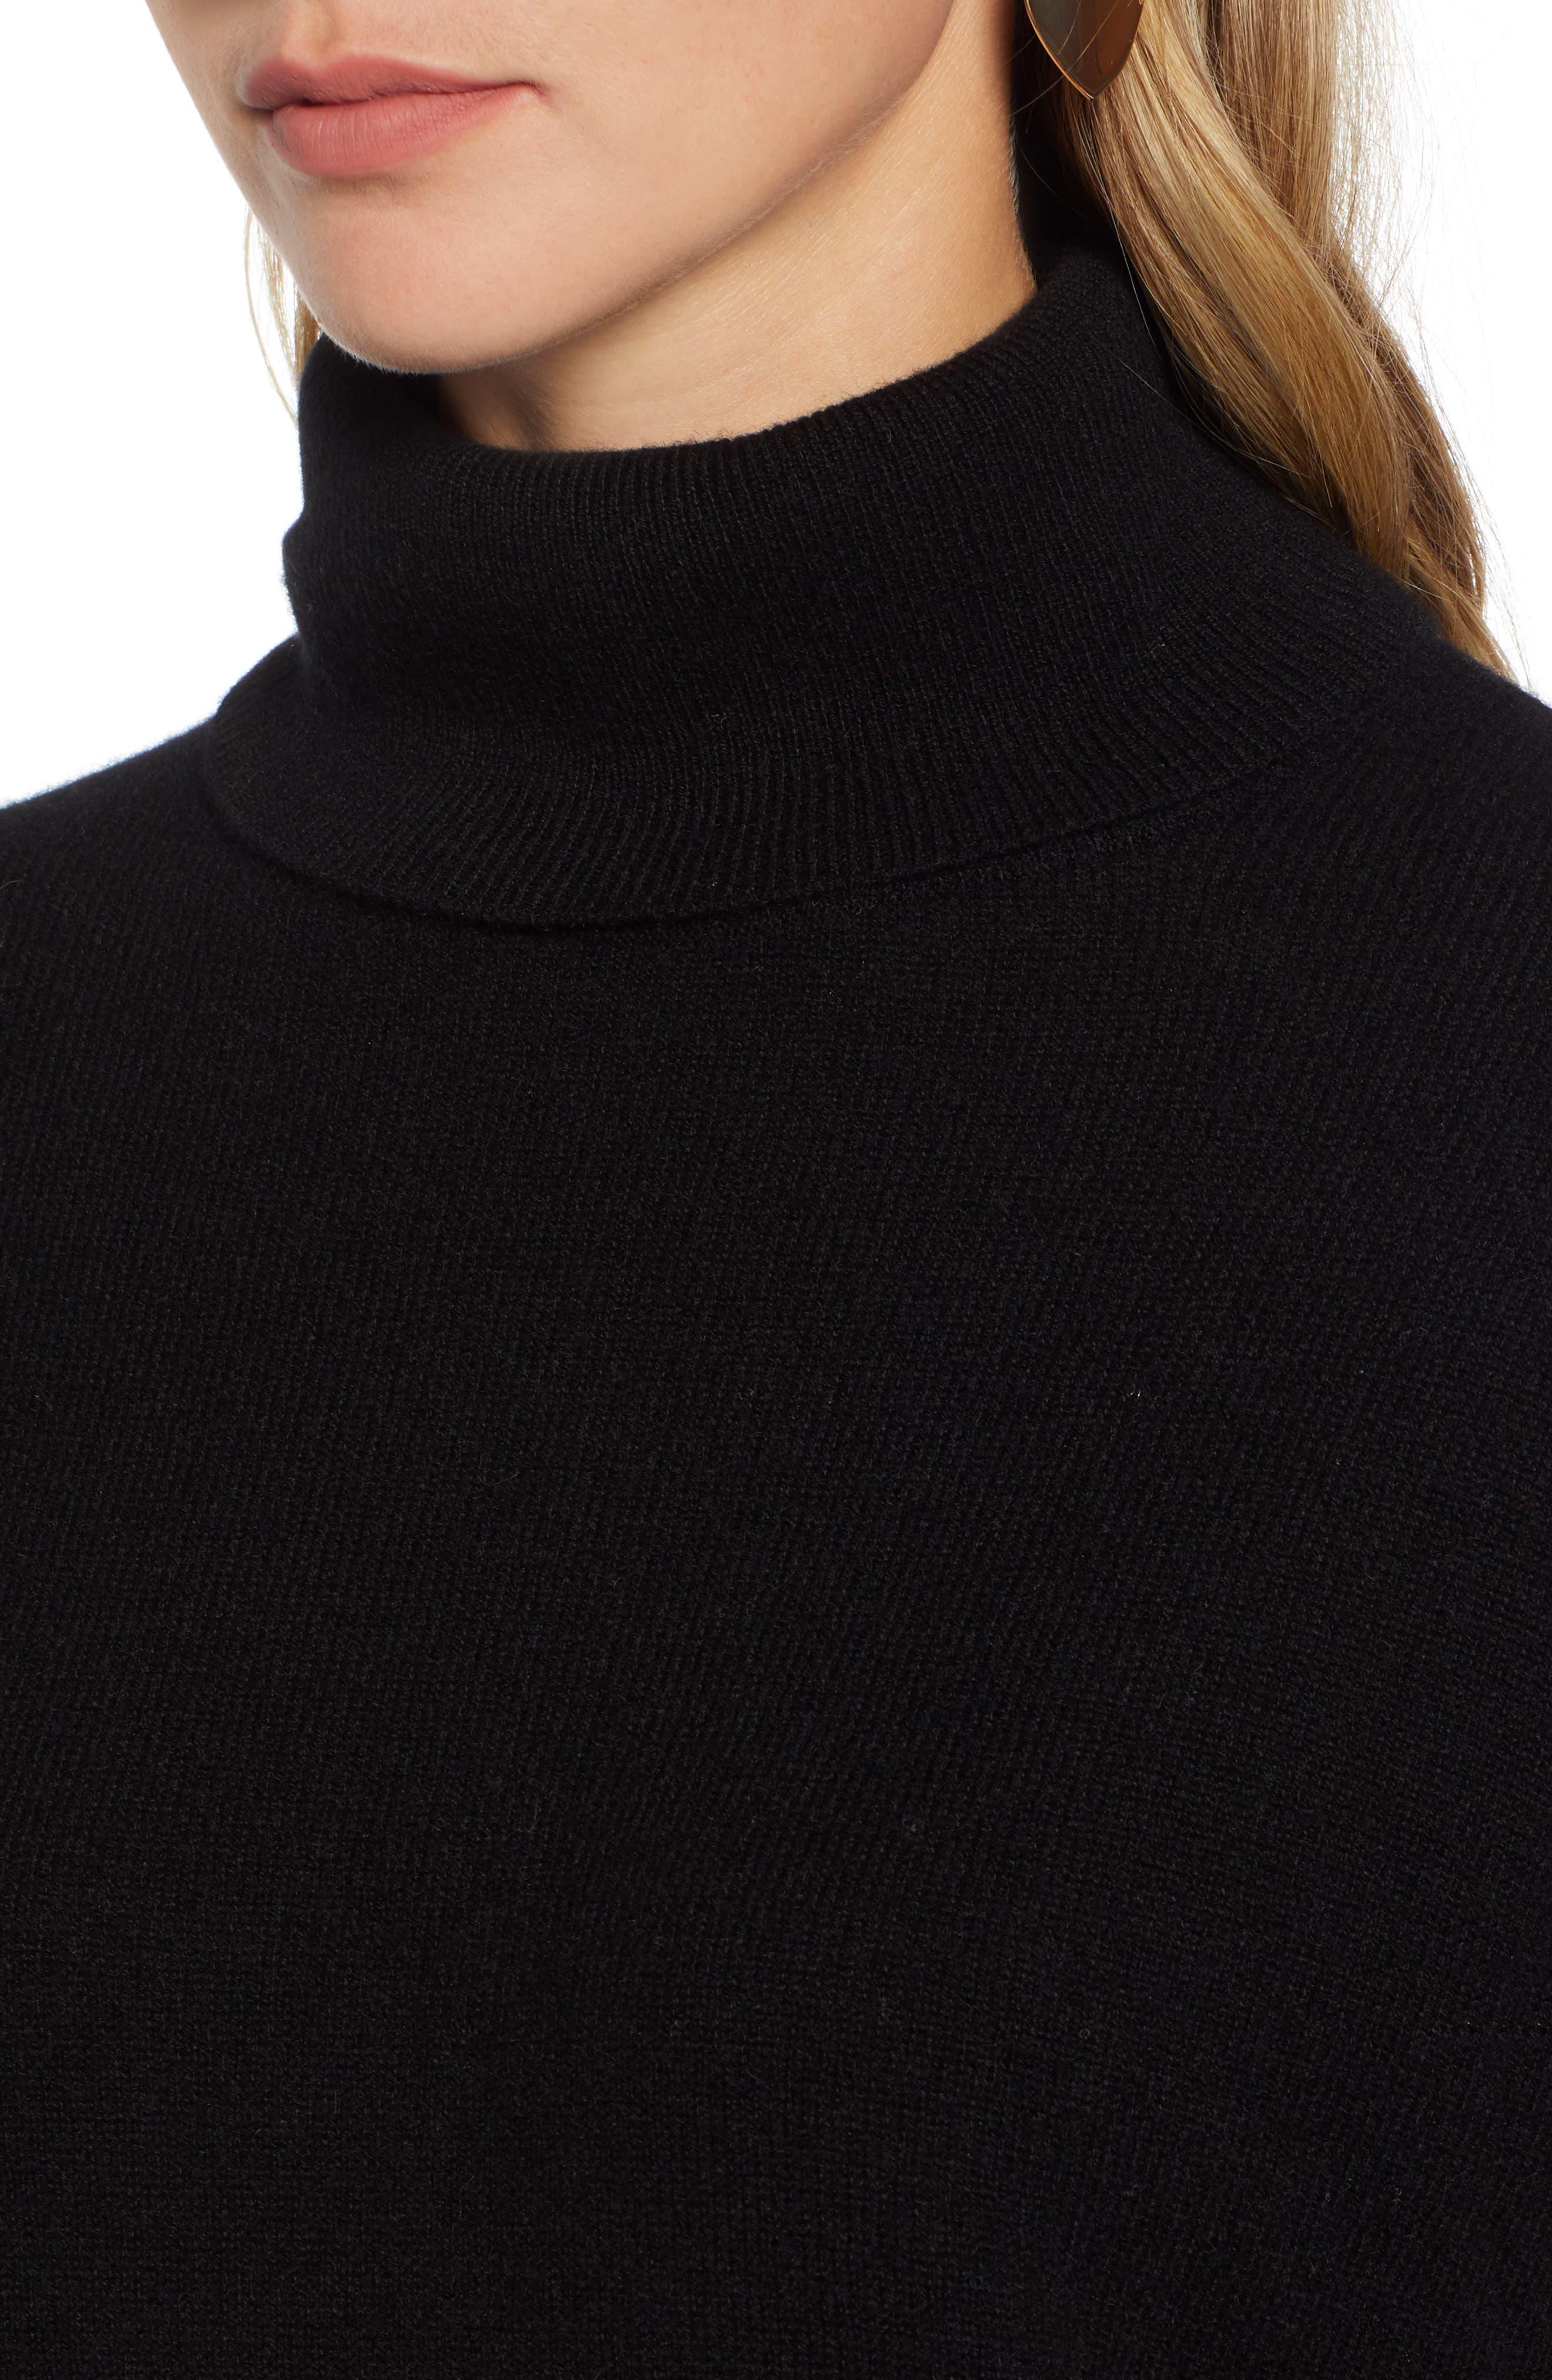 HALOGEN<SUP>®</SUP>, Cashmere Turtleneck Sweater, Alternate thumbnail 4, color, 001